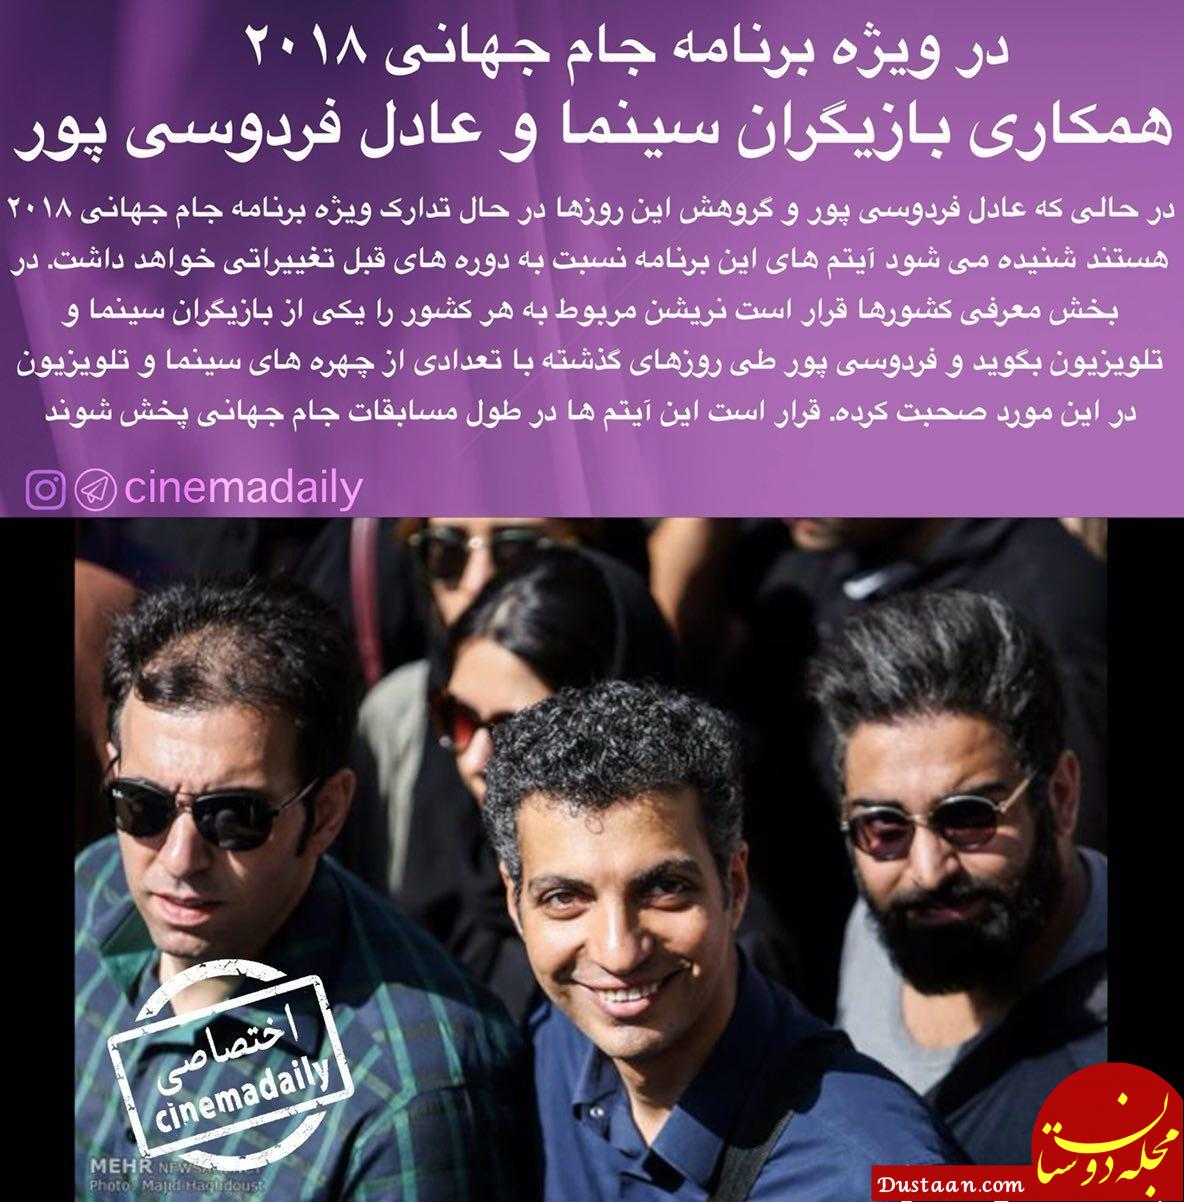 www.dustaan.com همکاری عادل فردوسی پور با بازیگران سینما +عکس